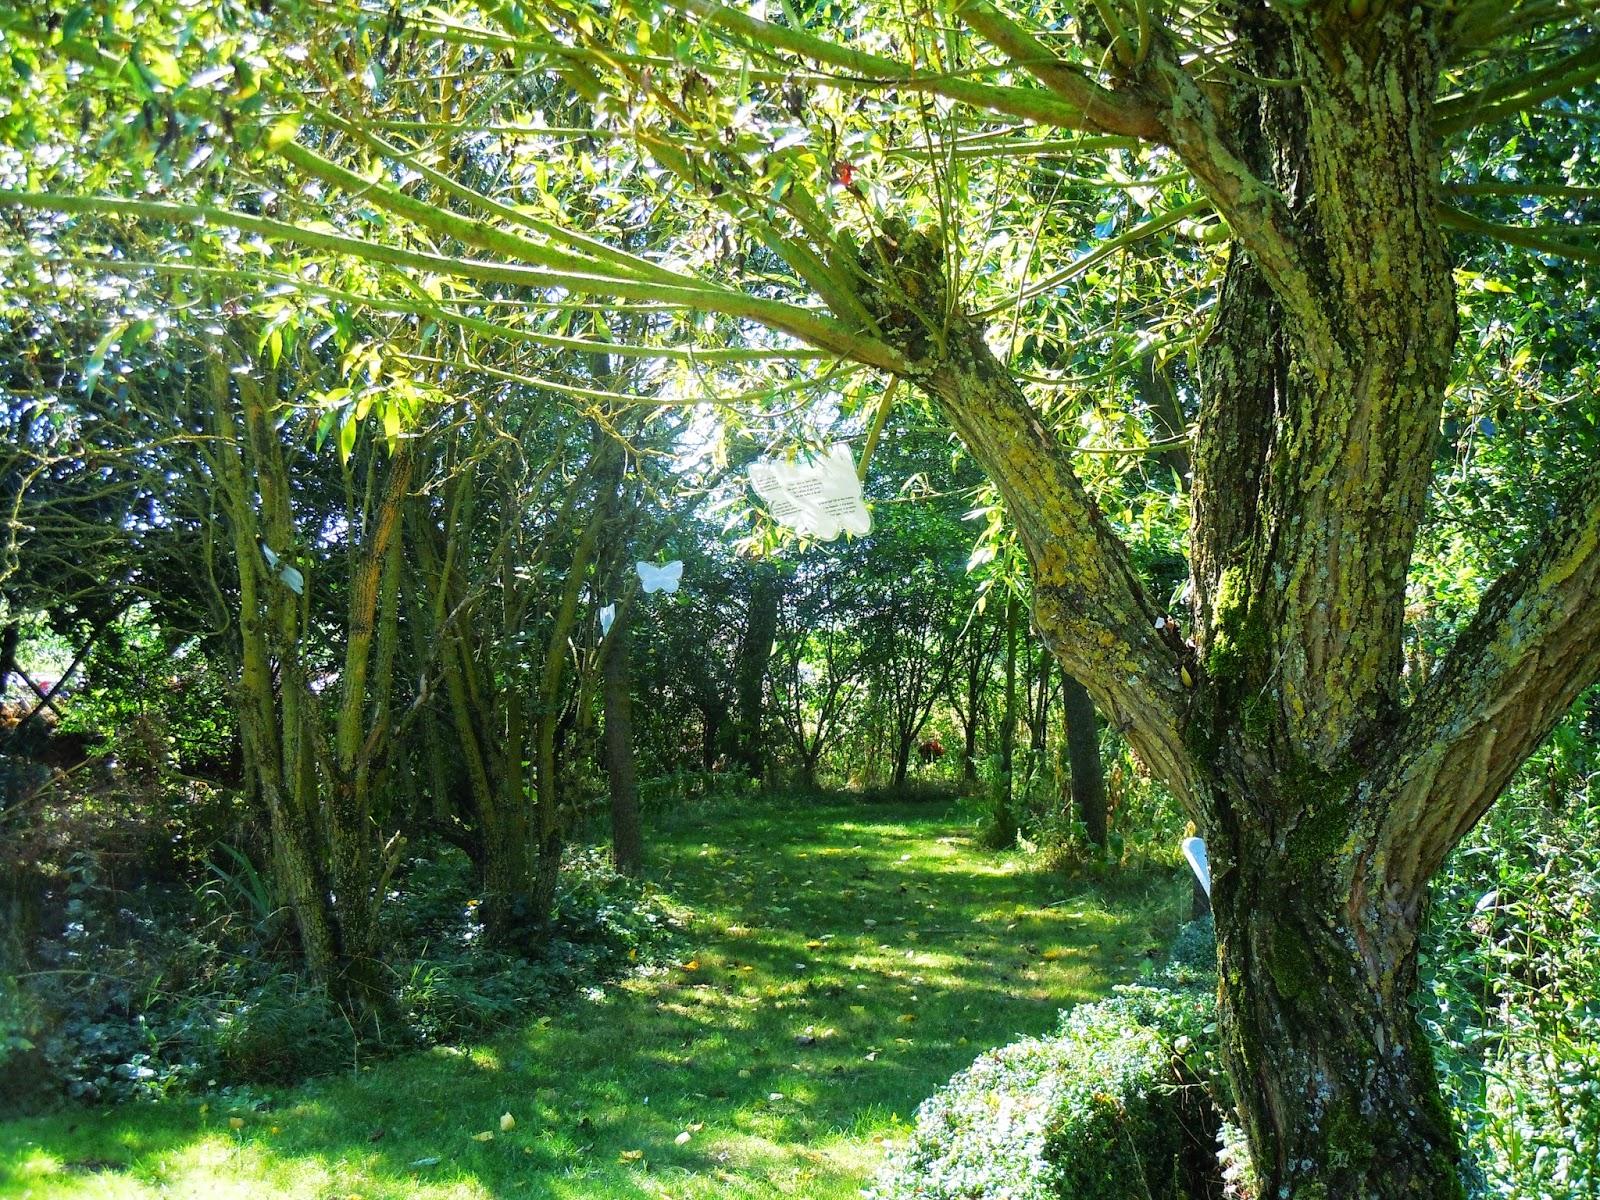 Le pantgat maison d 39 h tes jardin naturel du pantgat for Le jardin naturel lespinasse